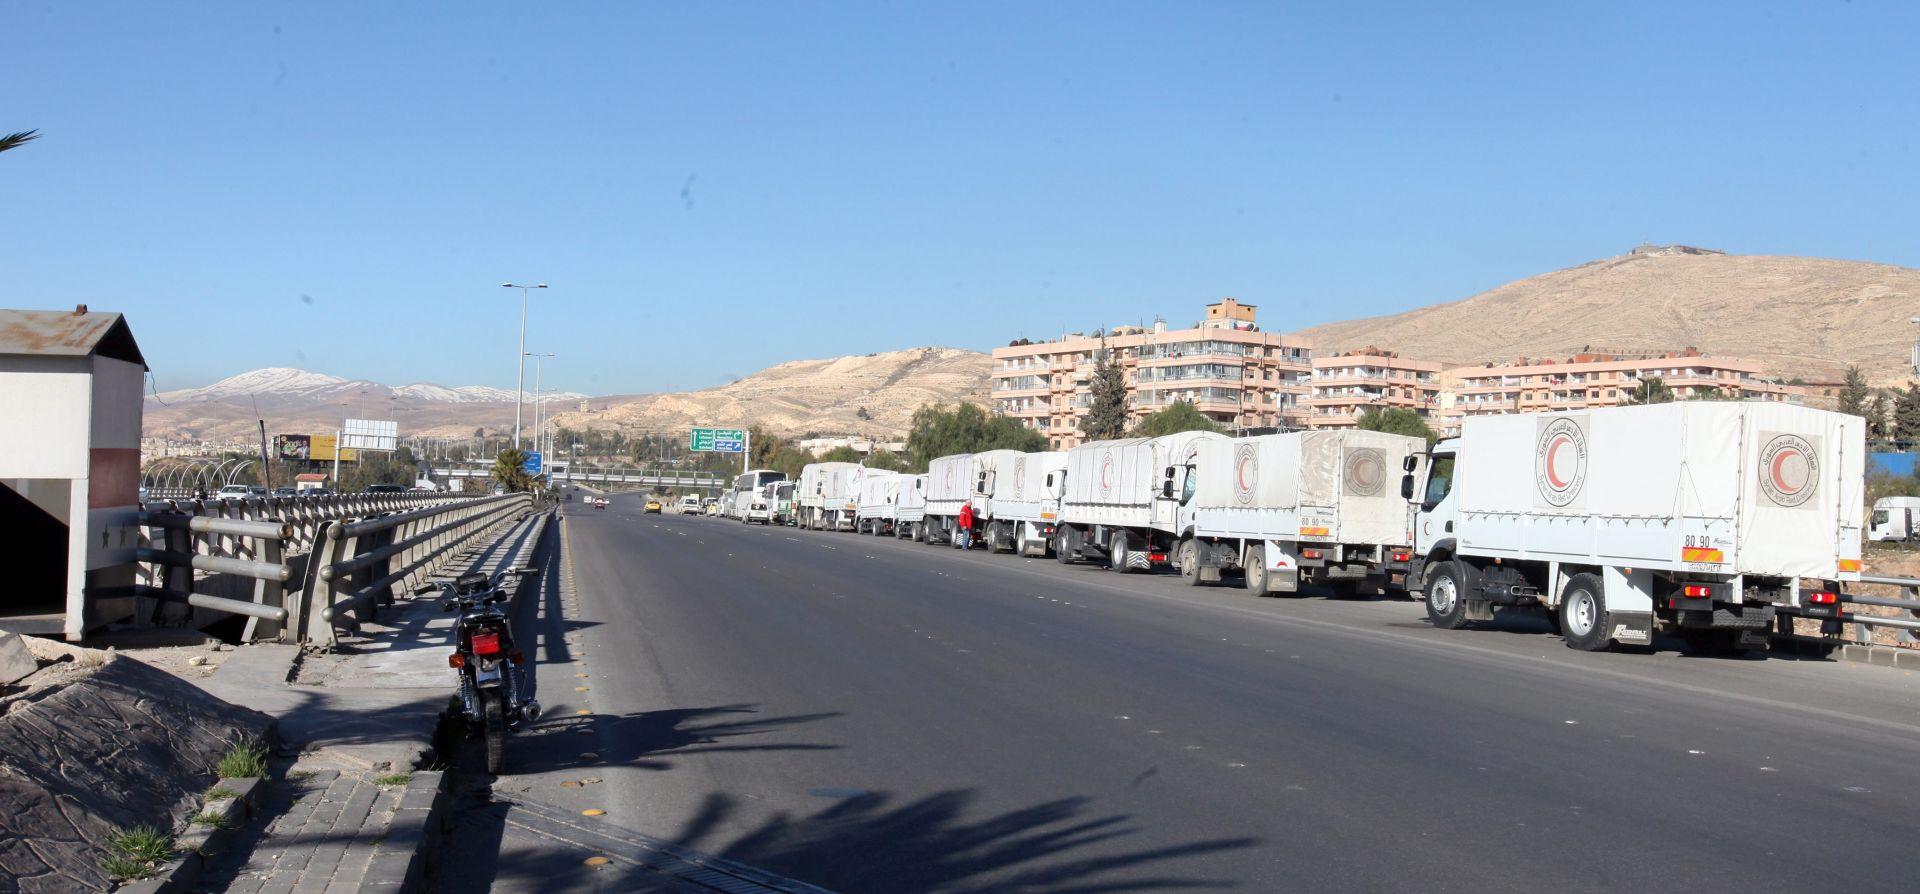 NAKON PRIMIRJA: Bombardirani kamioni s humanitarnom pomoći u blizini Alepa